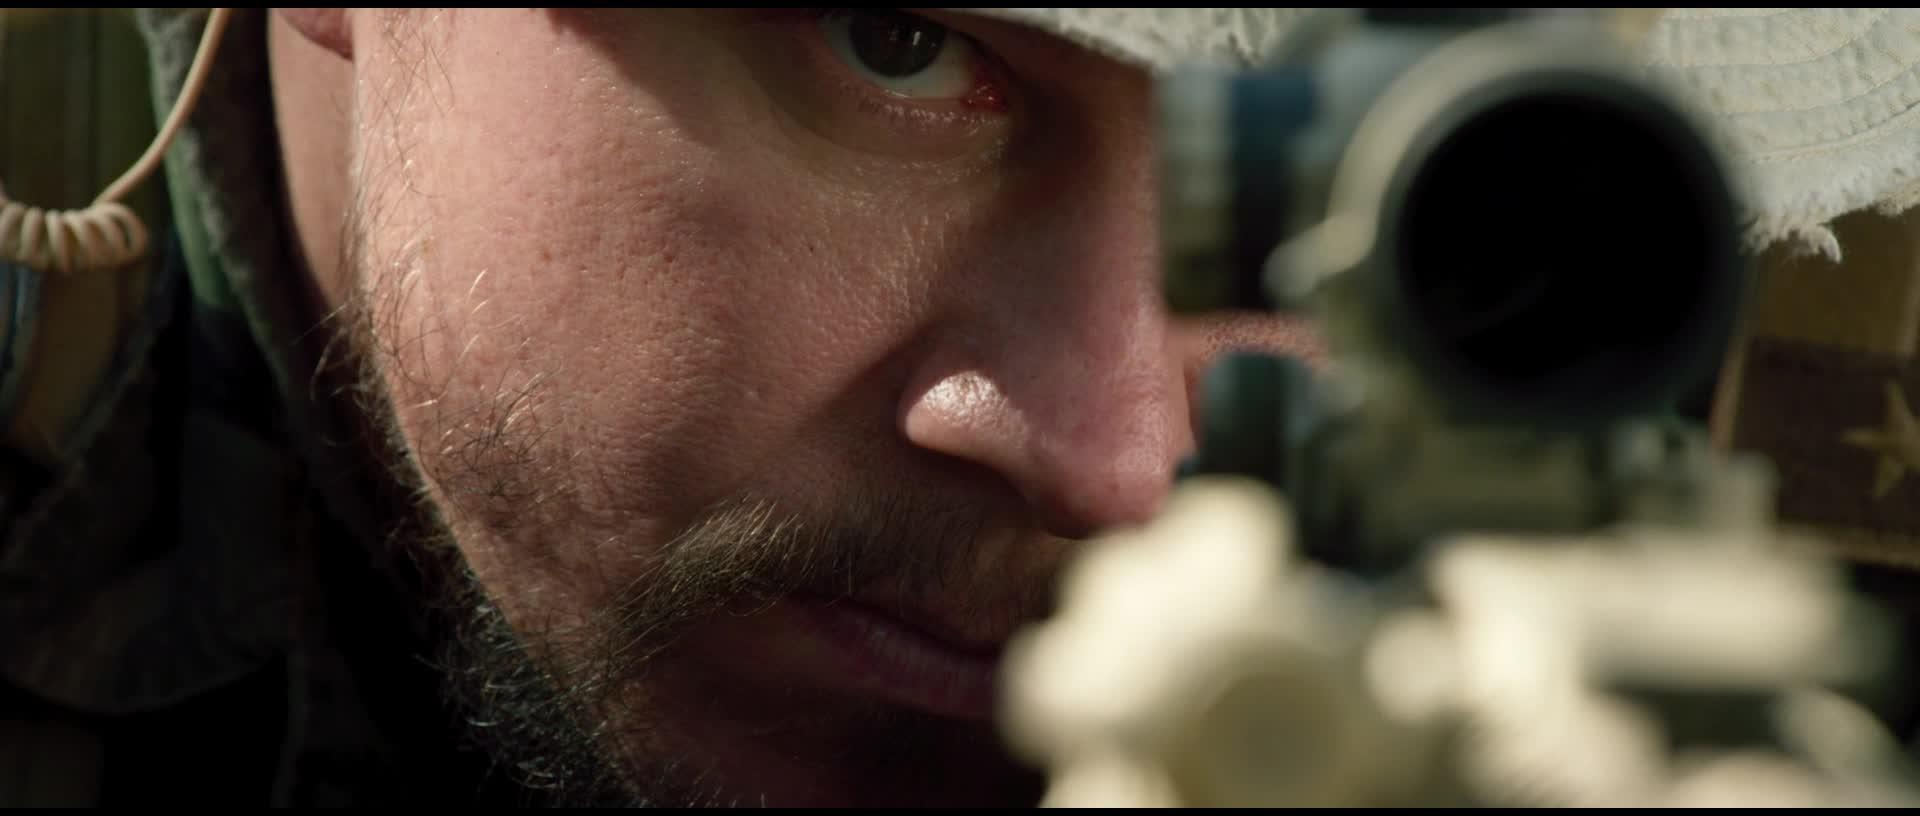 новинки кино 2013 смотреть онлайн уцелевший